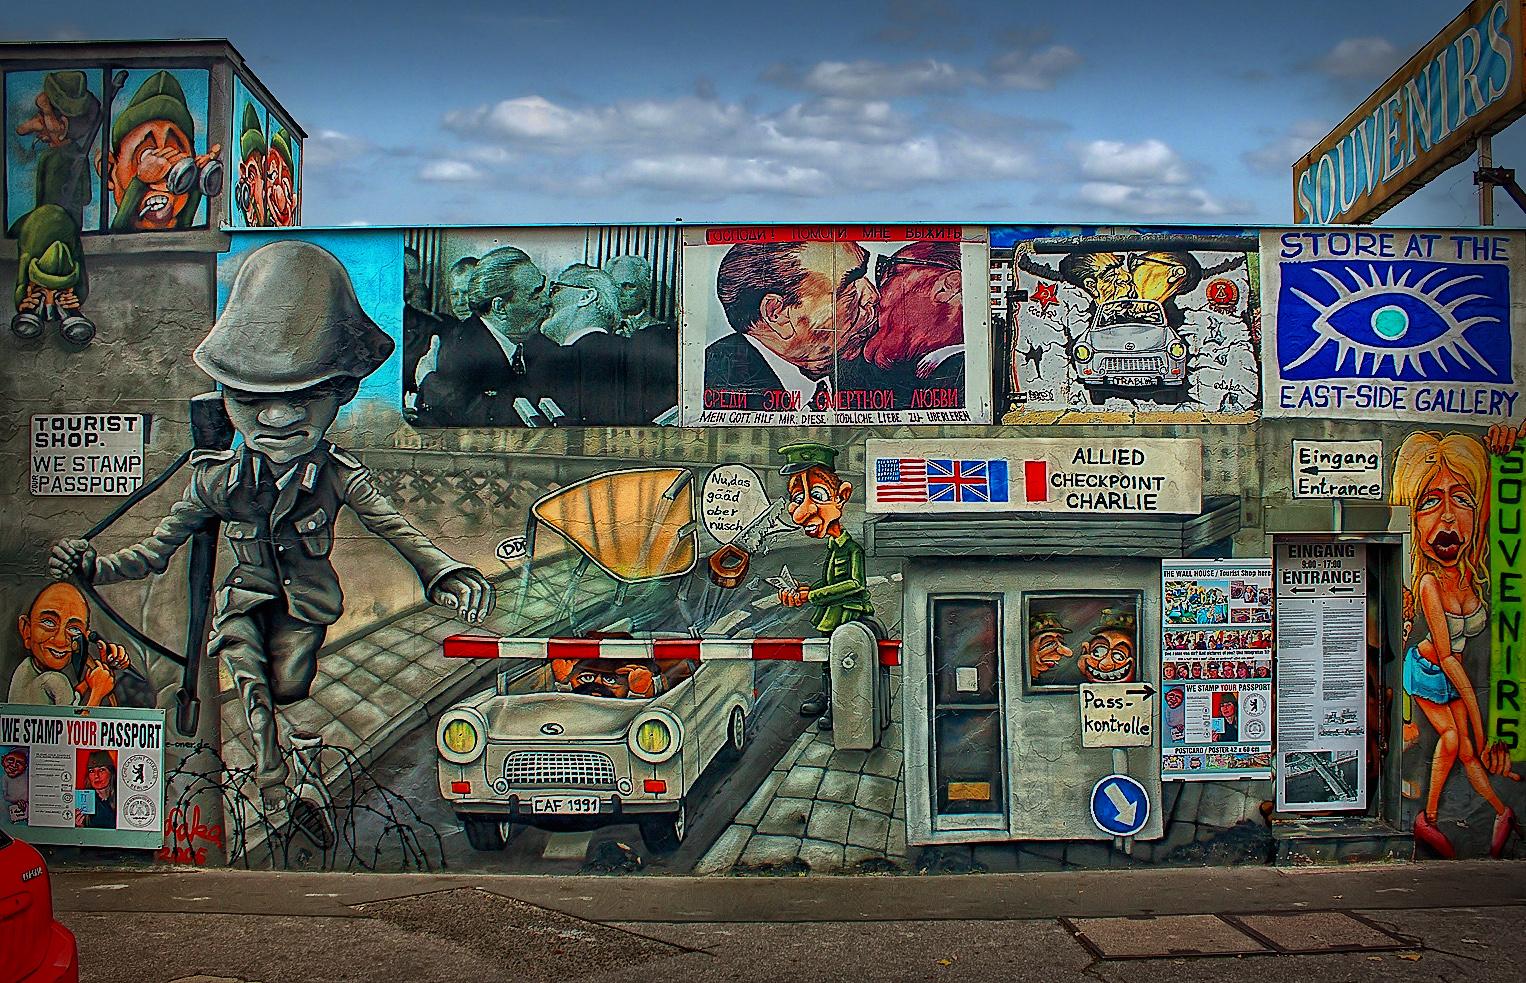 East Side Gallery | The Wall | Berlin Germany